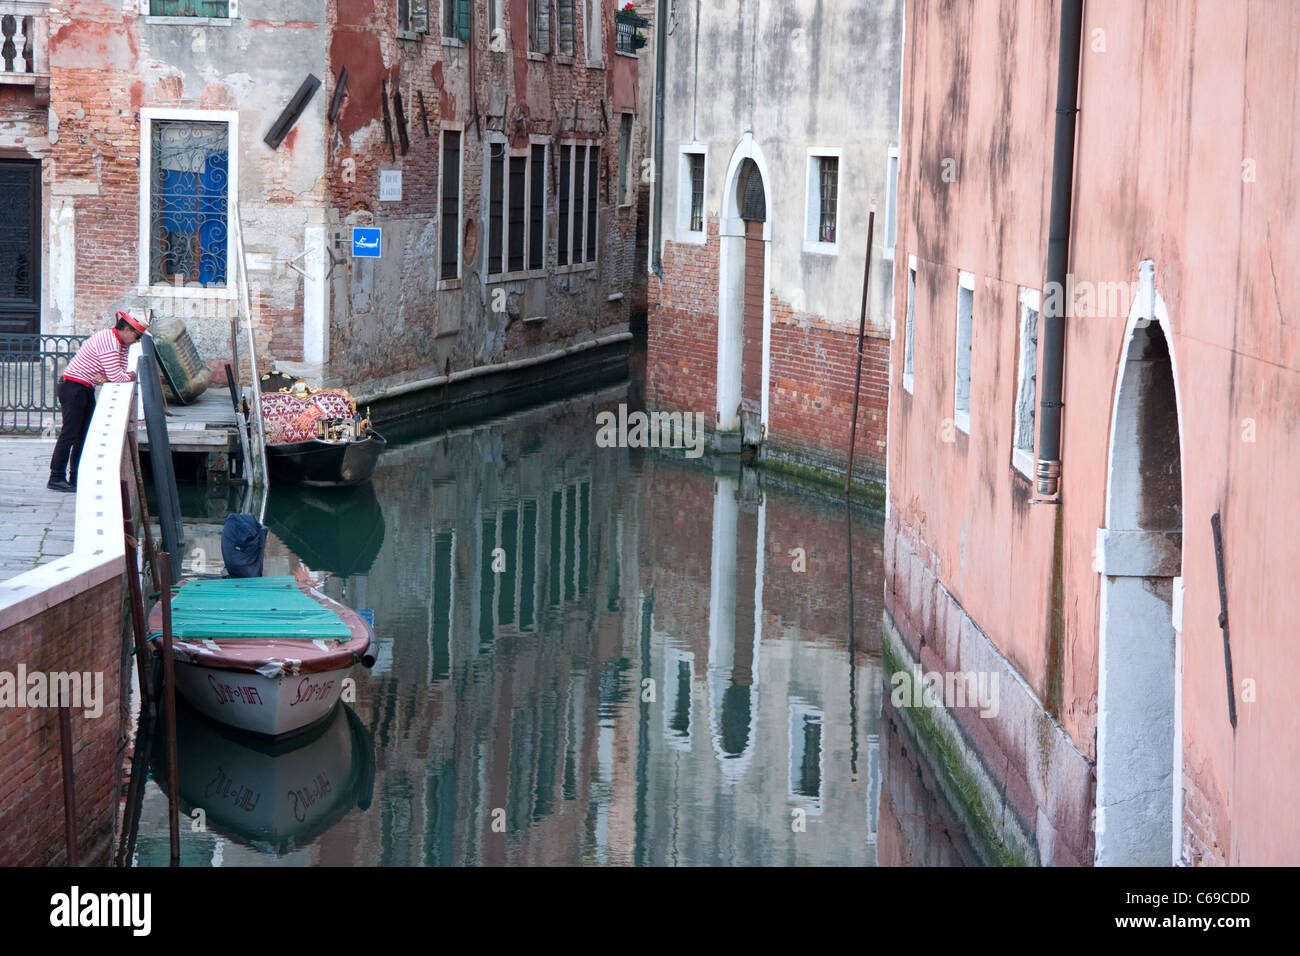 Gondolier overlooking Rio de S. Anzolo, Venice, Italy - Stock Image